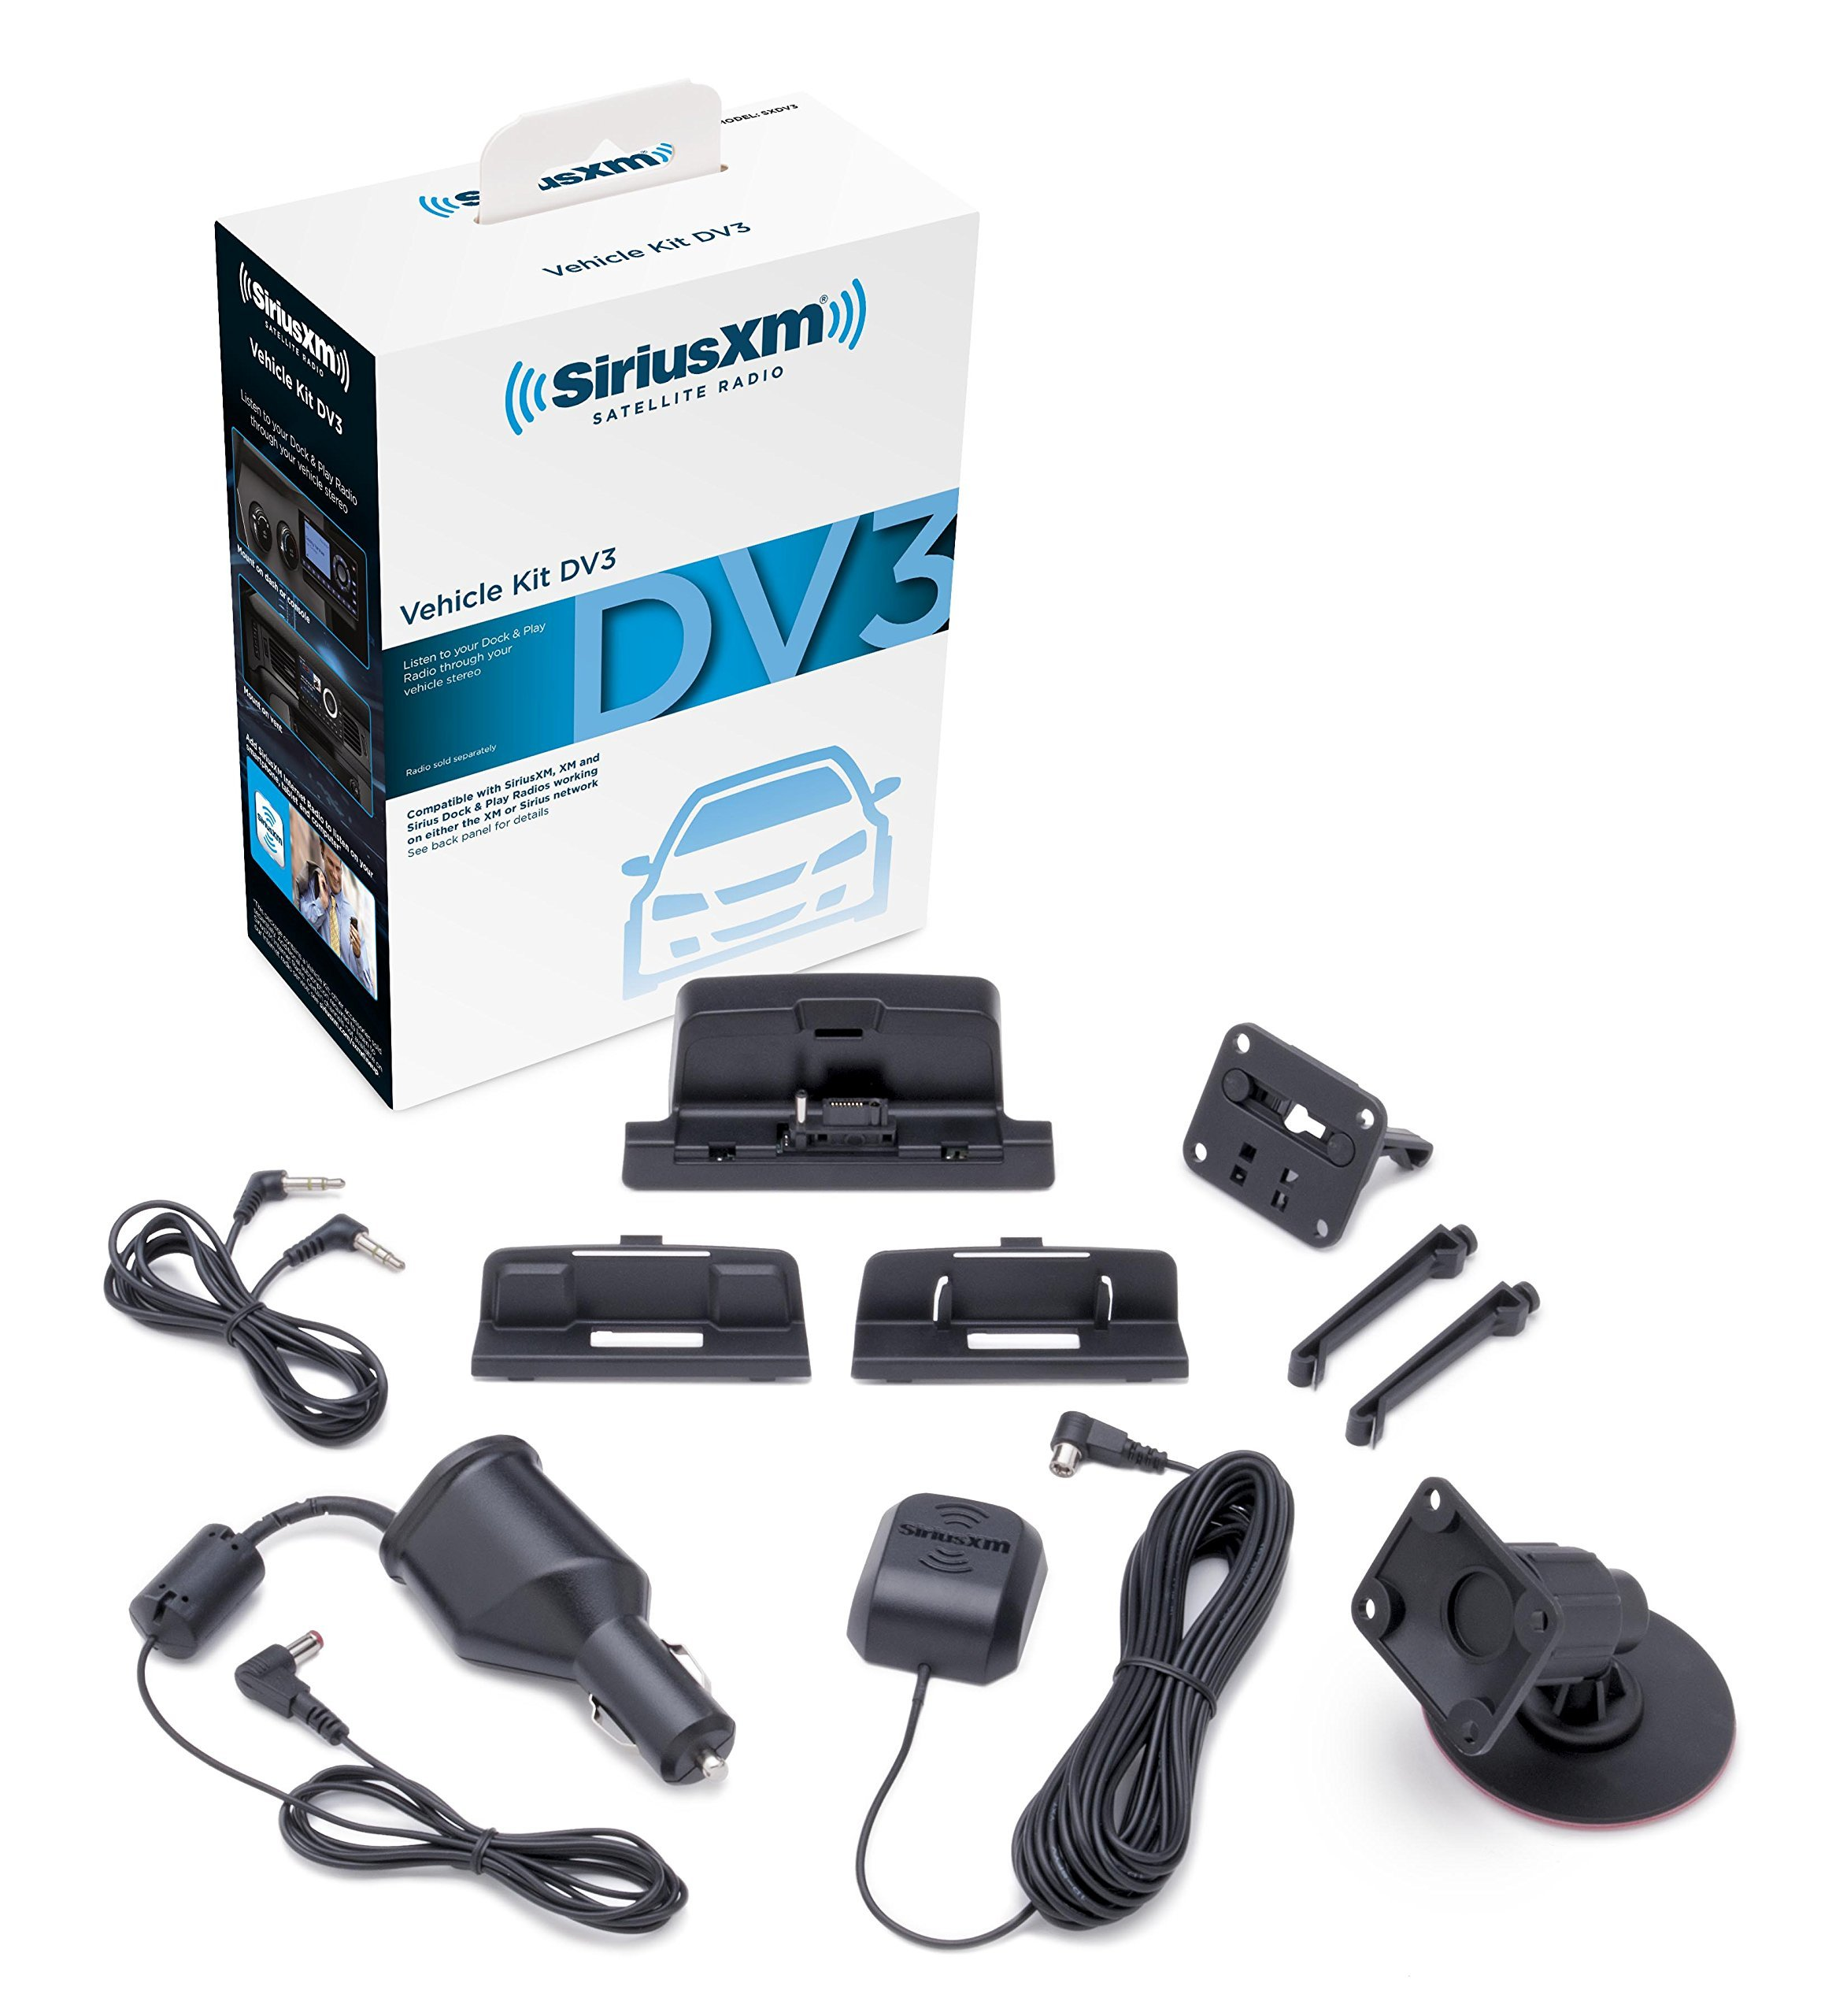 SiriusXM SXDV3 Satellite Radio Vehicle Mounting Kit with Dock and Charging Cable (Black) (Renewed) by SiriusXM